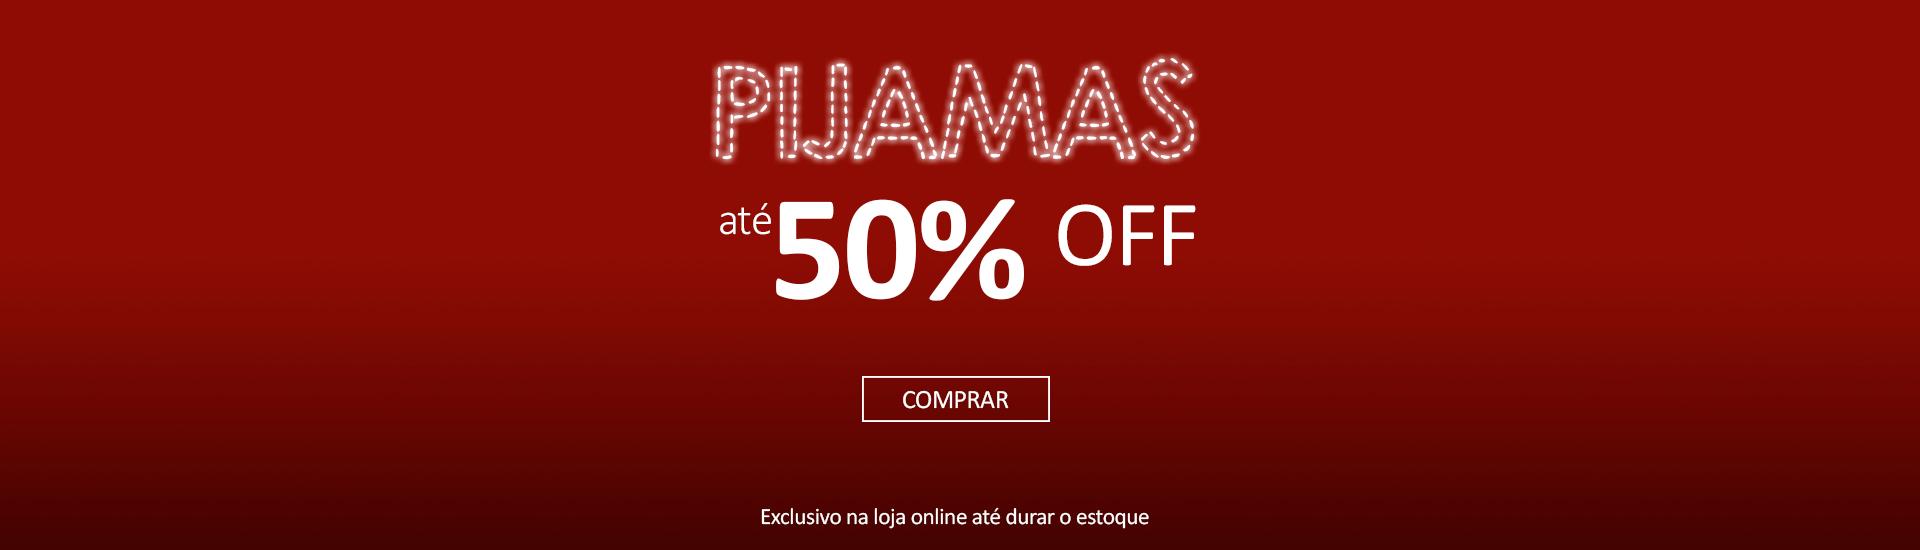 Pijamas - Até 50 OFF